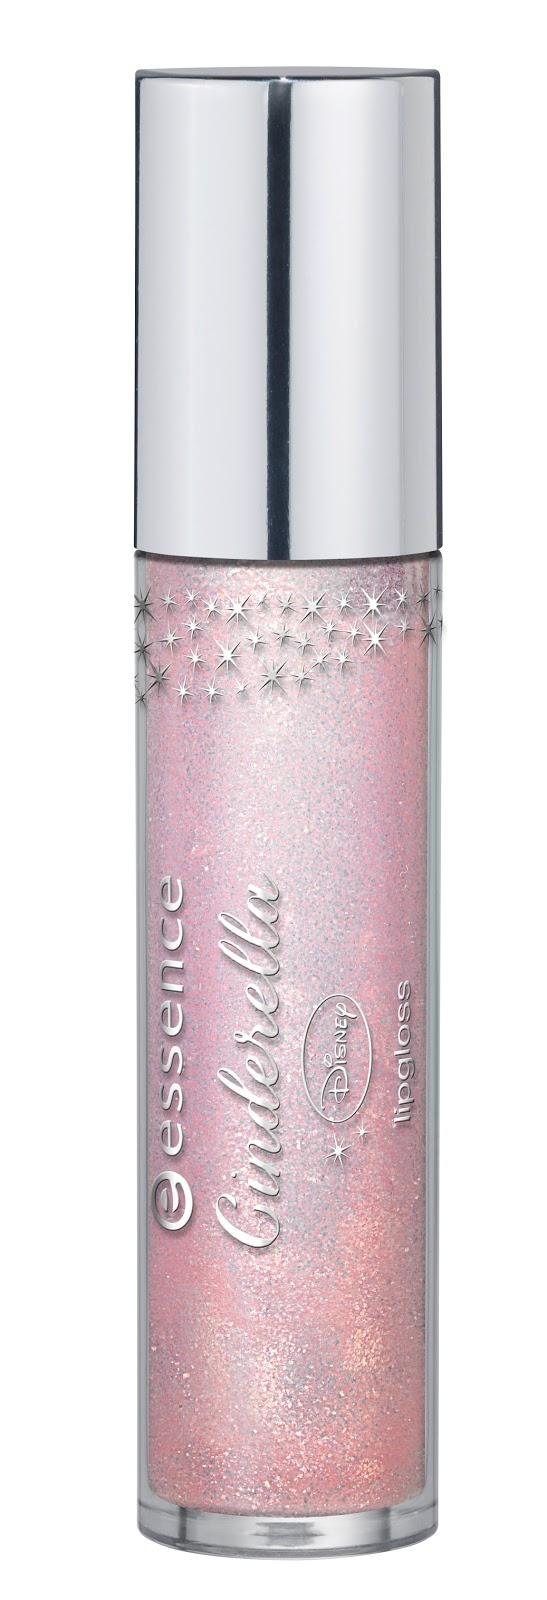 essence cinderella lipgloss